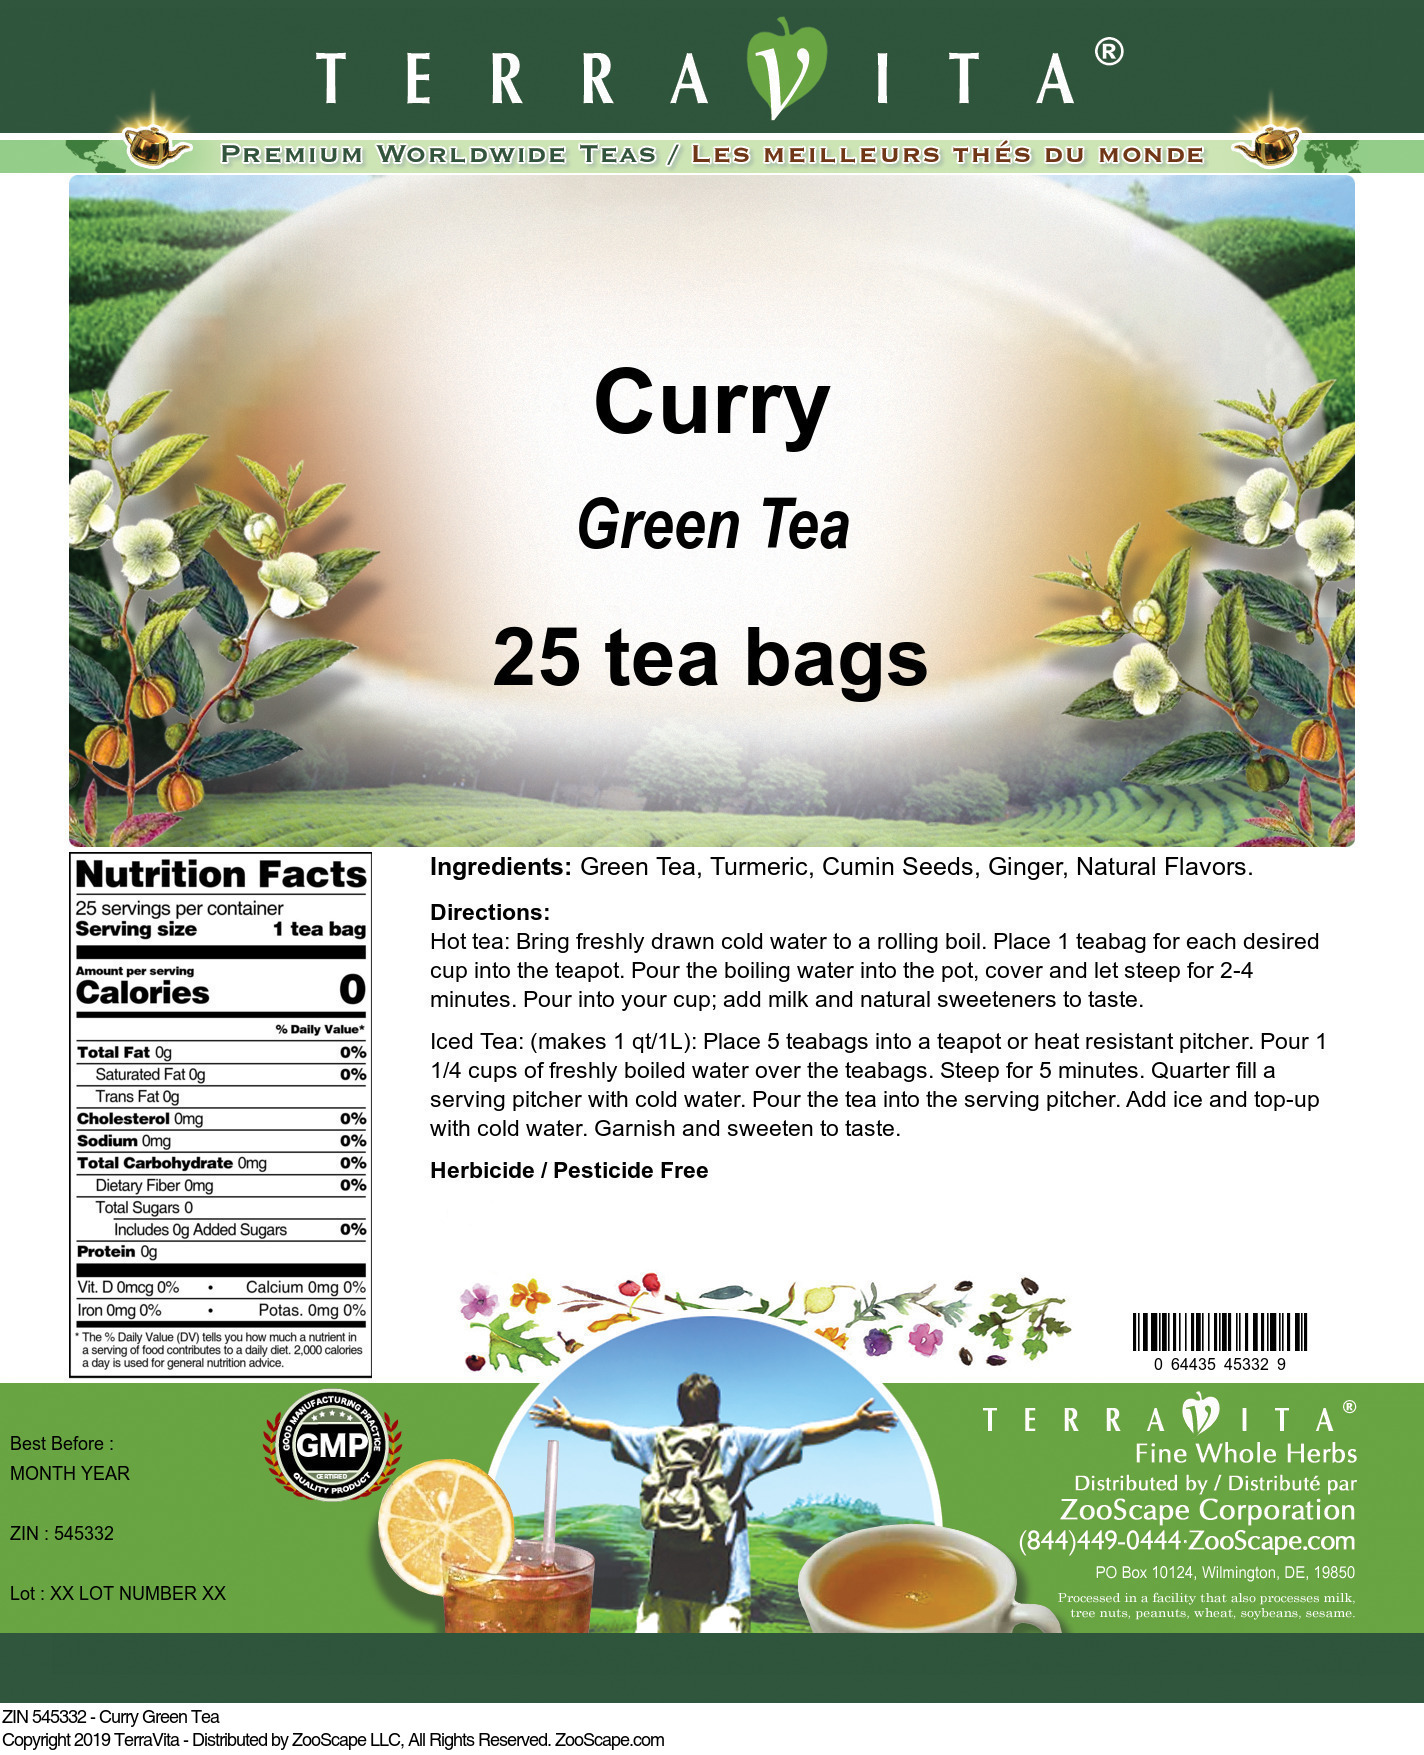 Curry Green Tea